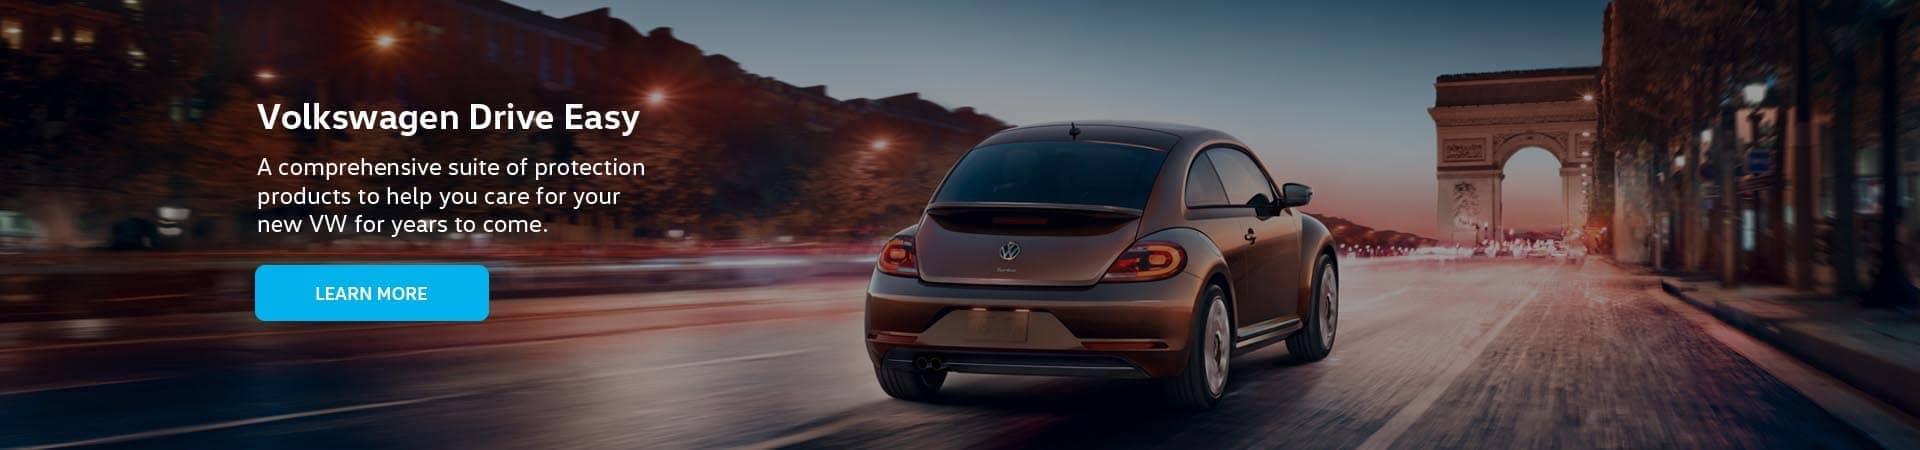 VW drive easy banner